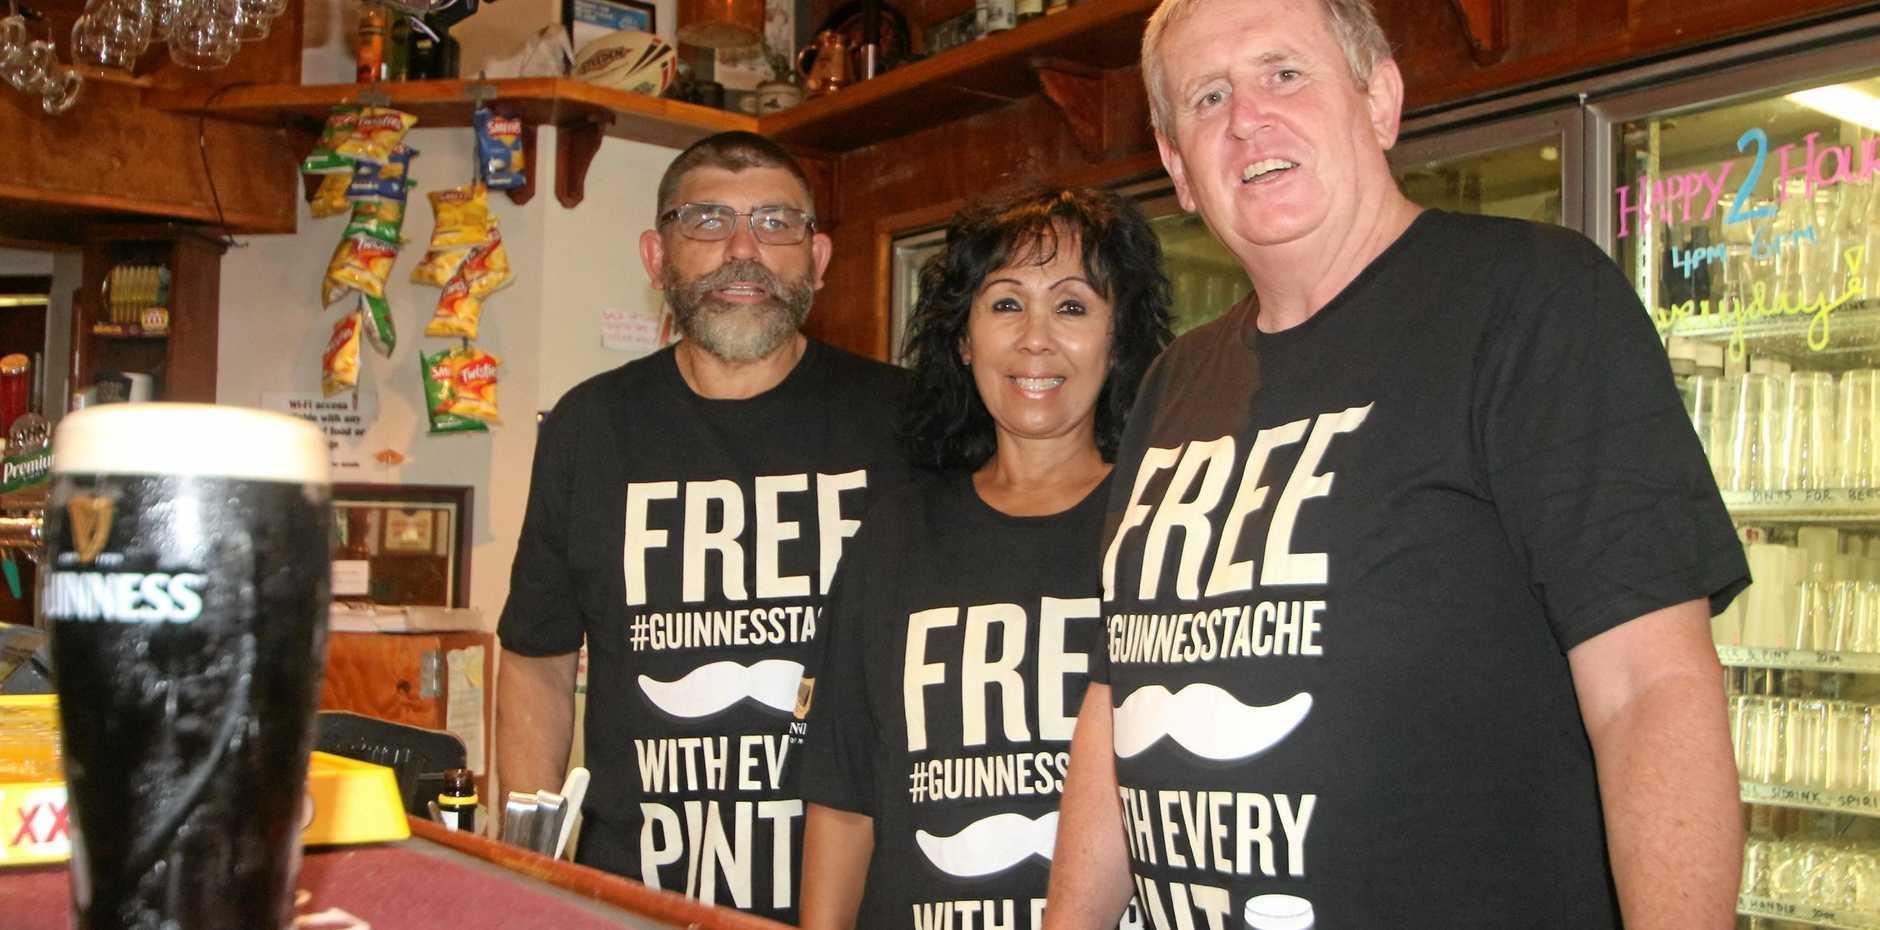 CHEERS: Paul Scott, Cheryl Royal-Scott and Patrick Barrett welcome you to a new era of dining at Hoolihans Irish Restaurant and Bar.